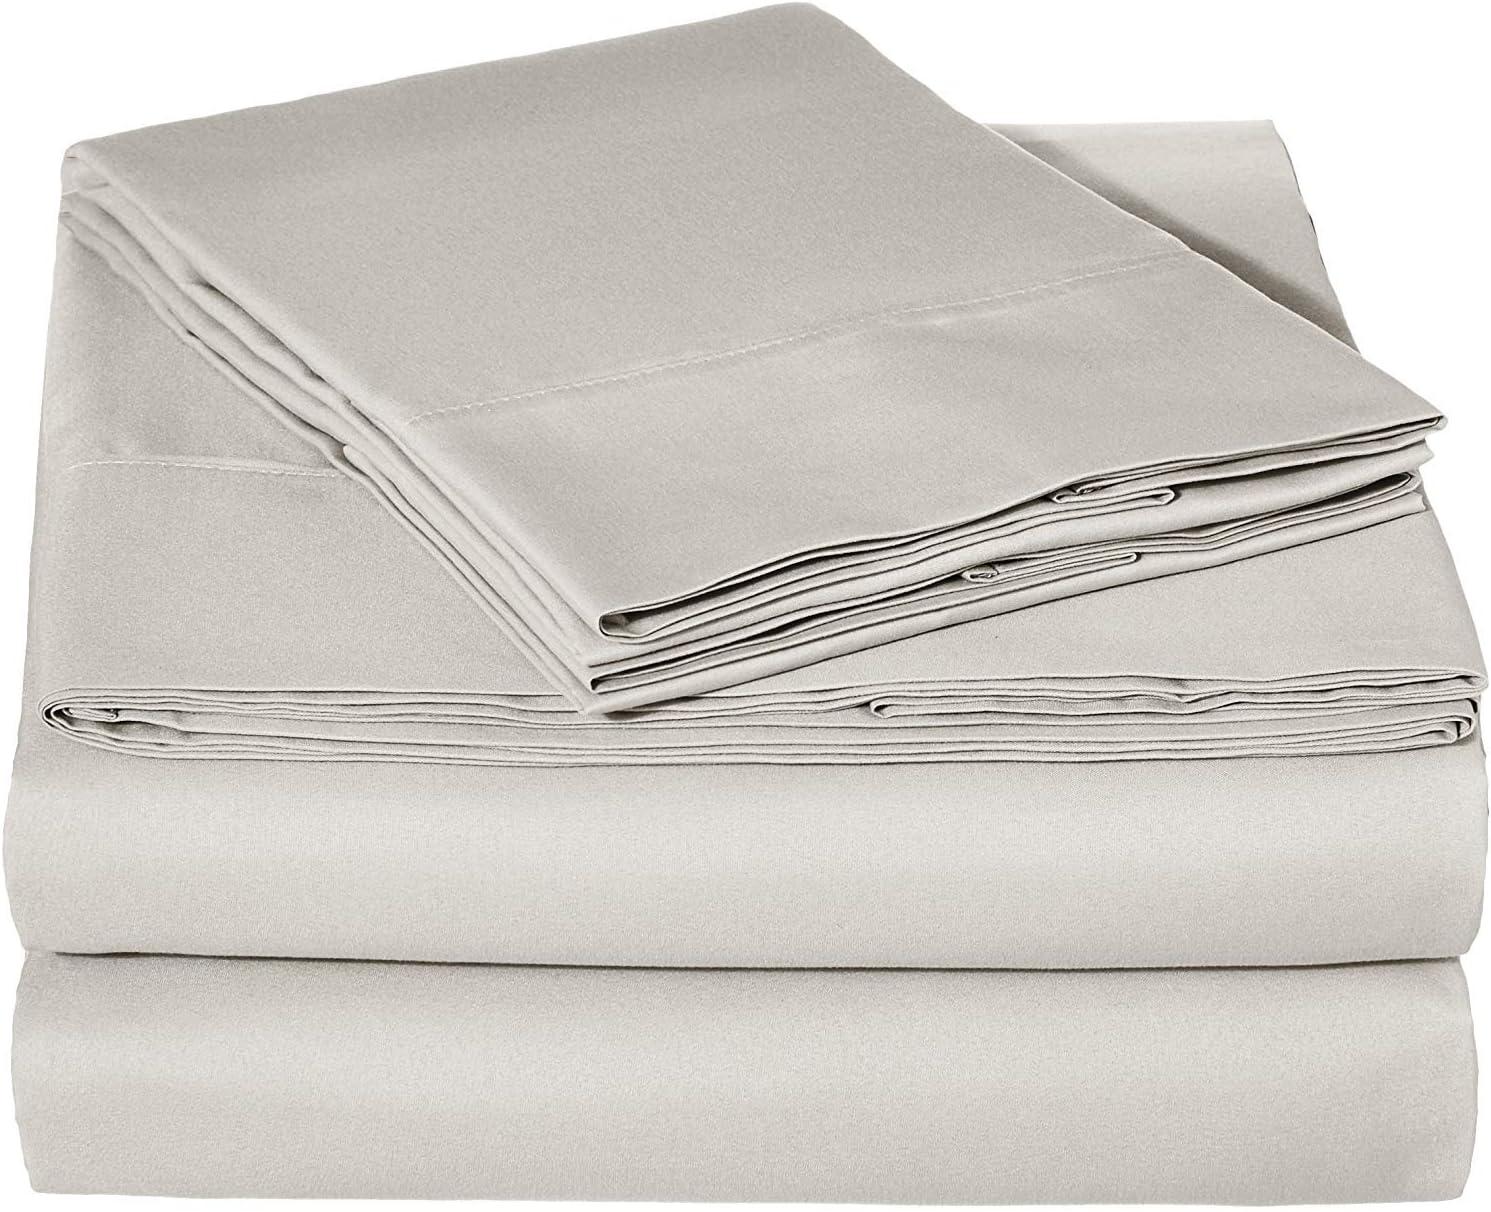 4PCs Cal King Set Sheets Luxury Soft 100% Egyptian Cotton - Sheet Set for Cal King Sheets Set Silver Solid 800 Thread Count 14'' Deep Pocket (Cal King Silver Sheets)